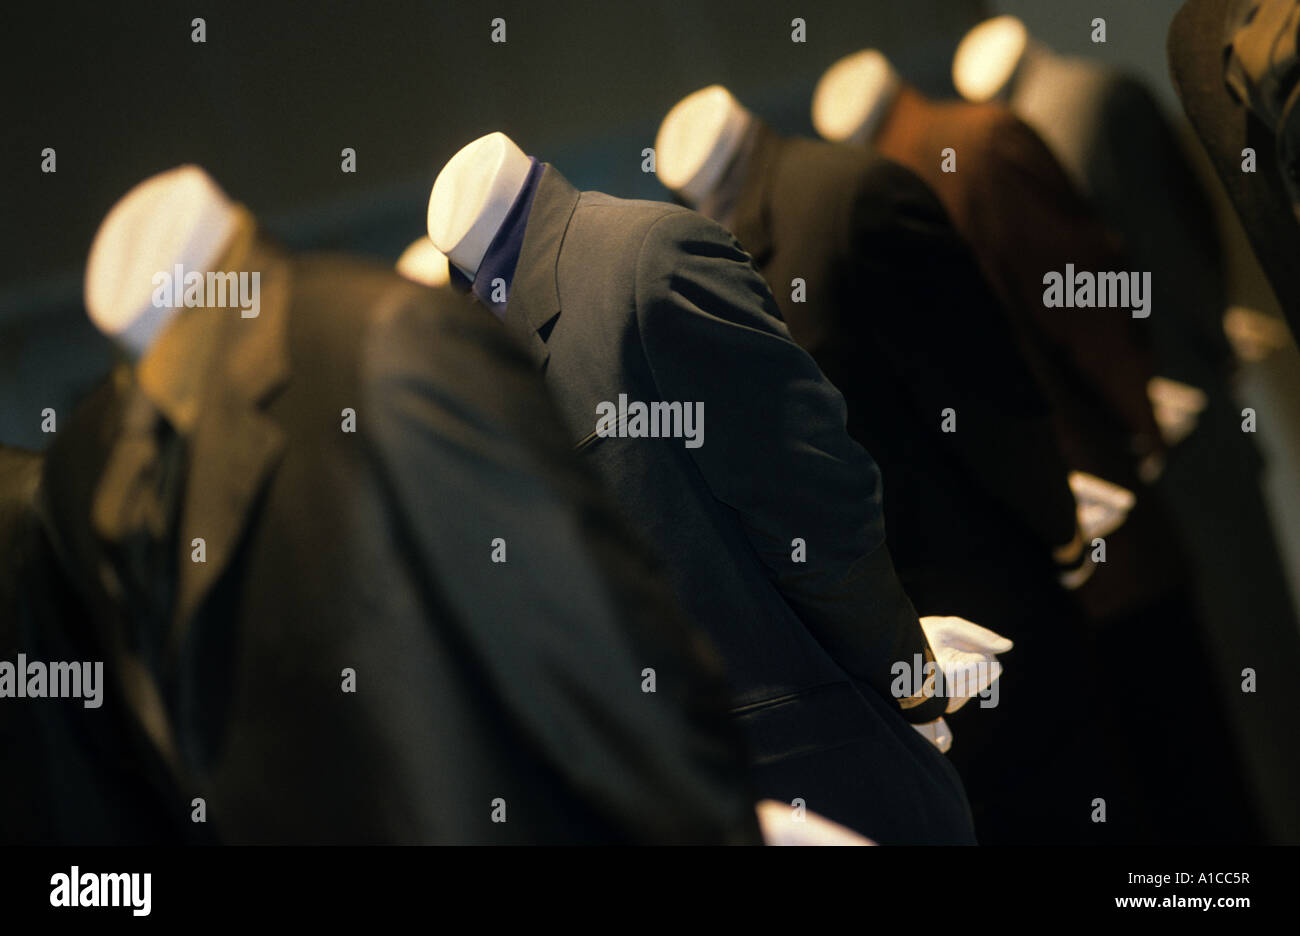 Modelos anónimos descabezados moda hombre palo similitud Imagen De Stock